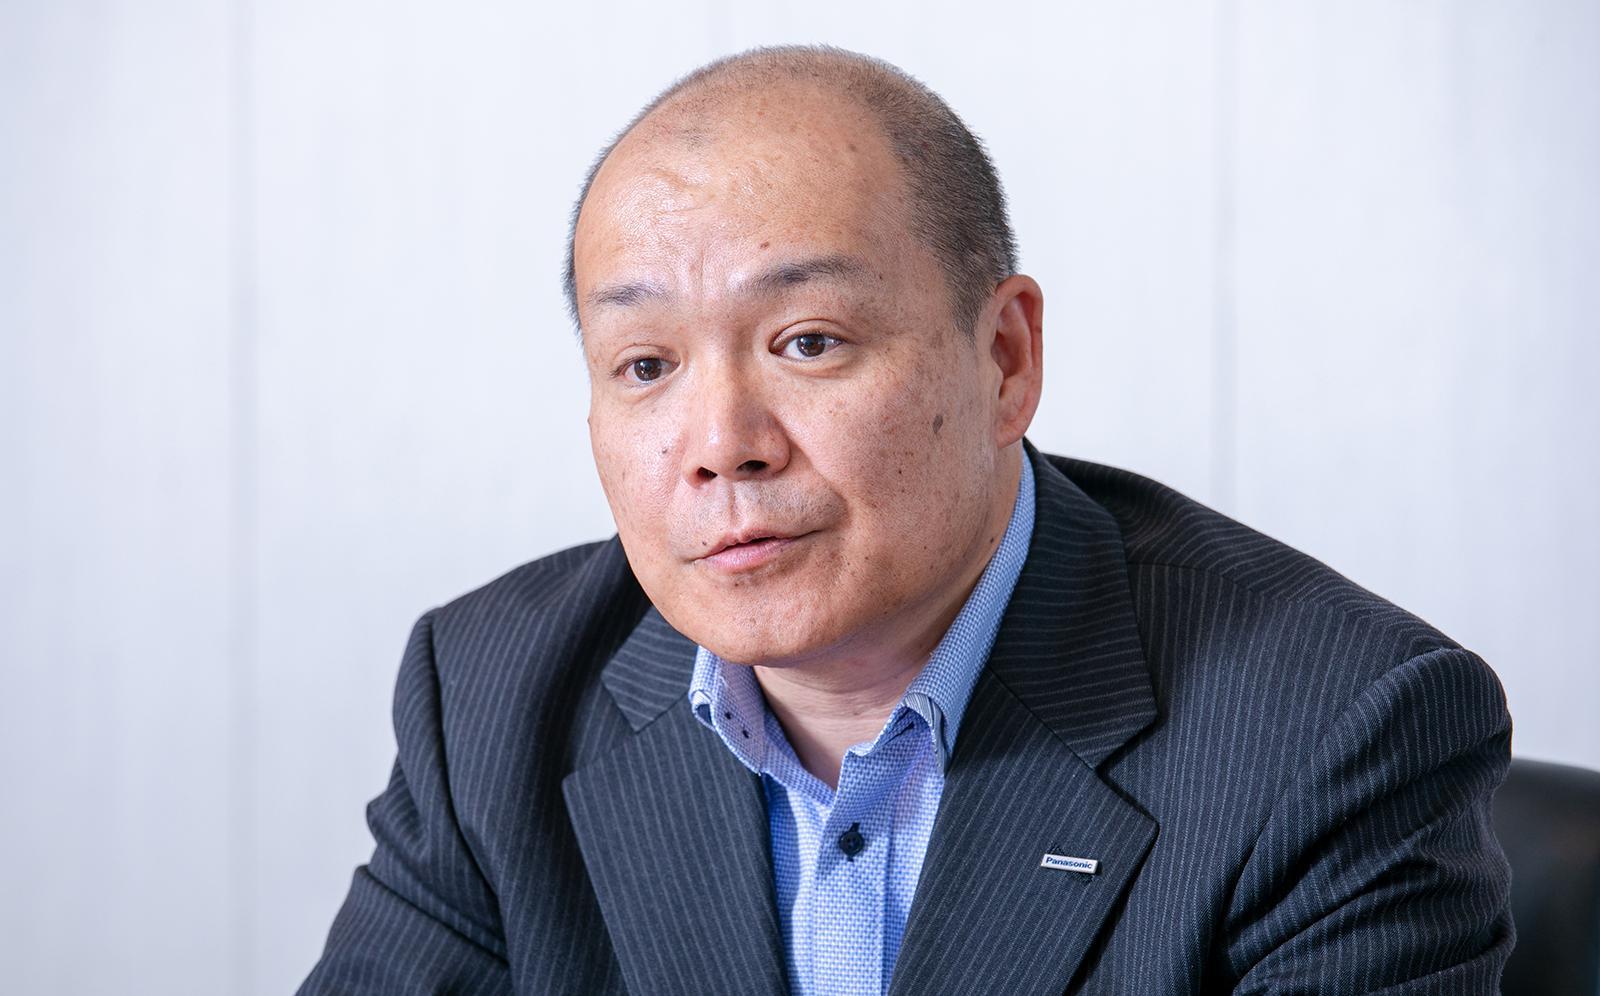 Photo: Hiroki Nishikawa, Chief Engineer & Smart City Promotion Rep, Integration Planning Sect., Communication Dept., Life Solutions Company, Panasonic Corporation